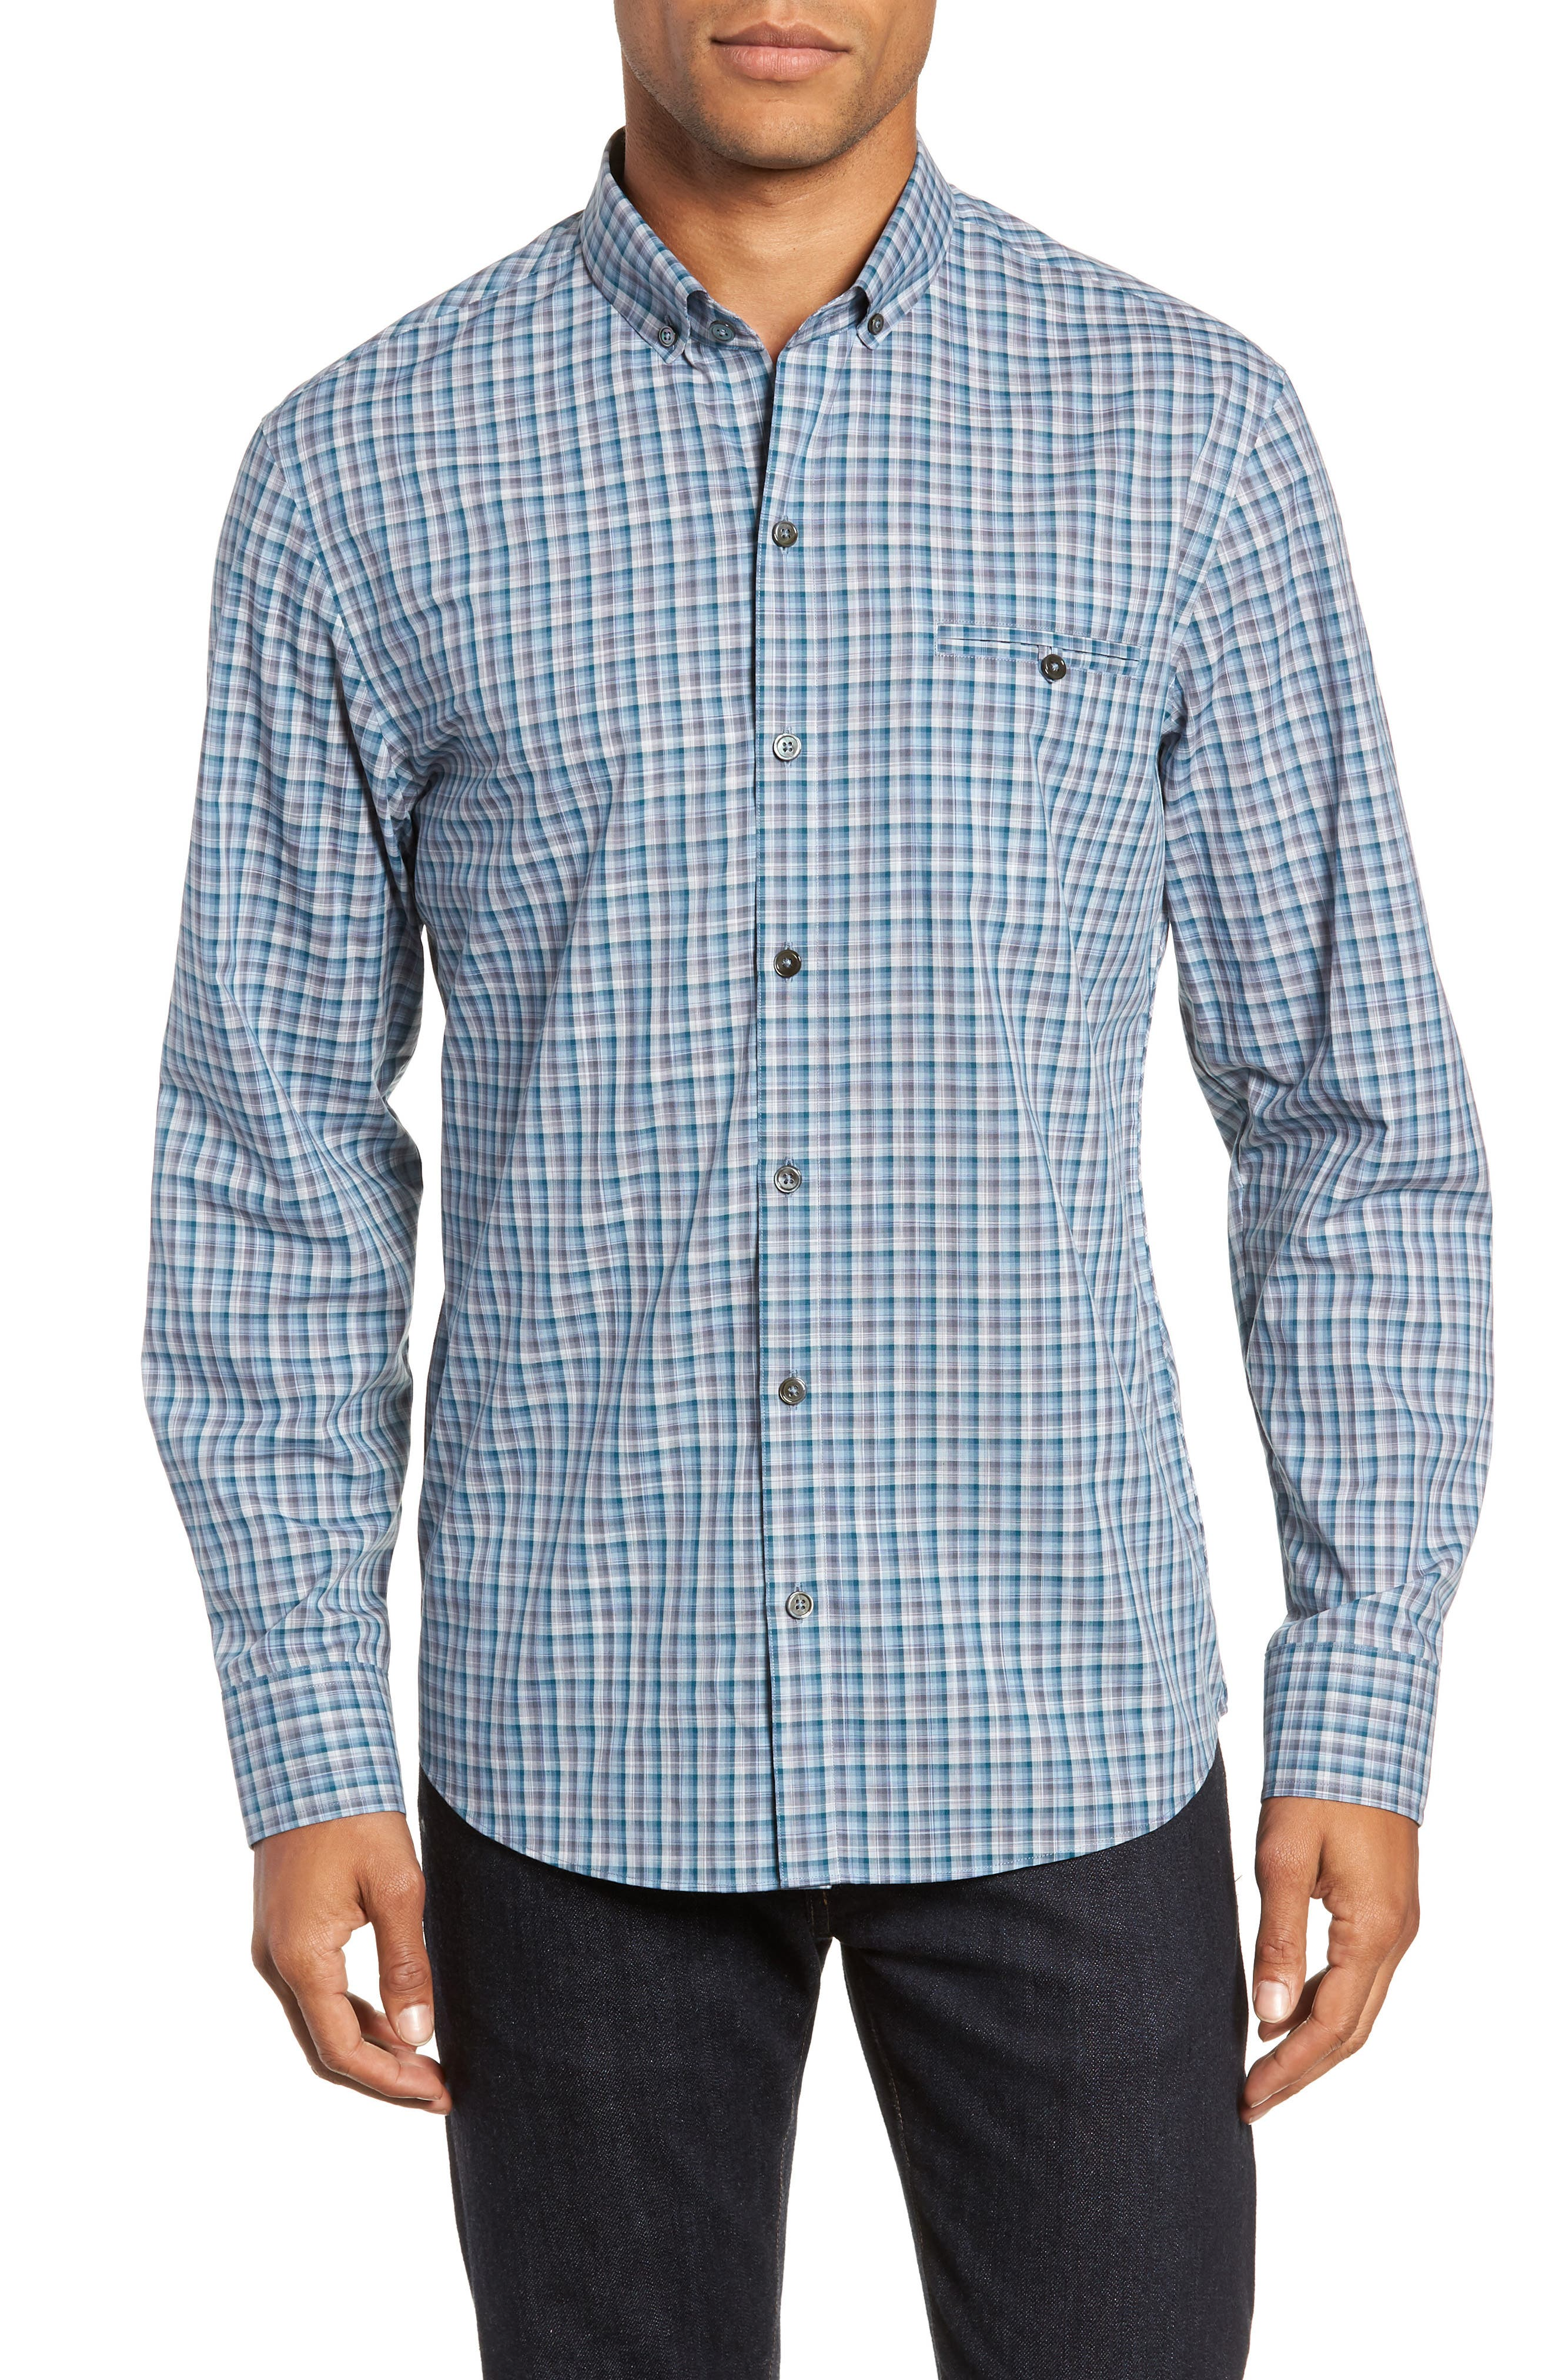 ZACHARY PRELL Godinez Regular Fit Check Sport Shirt, Main, color, 475